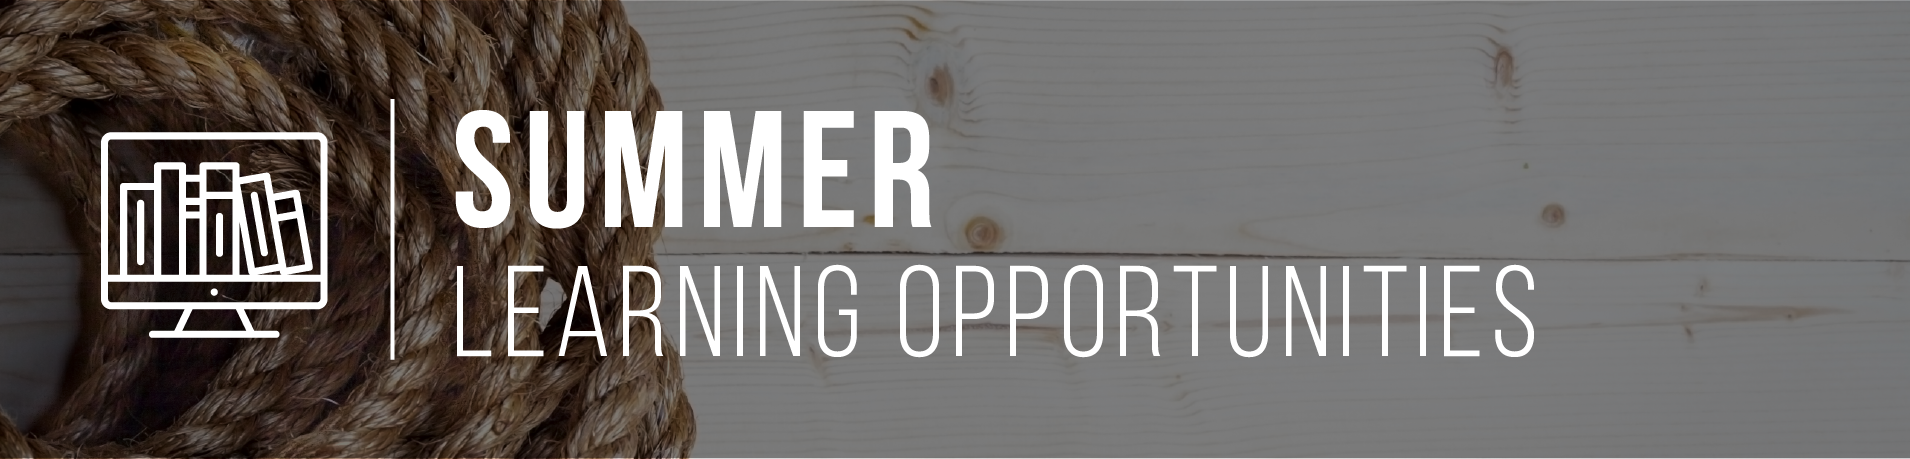 Summer Learning Opportunity Banner